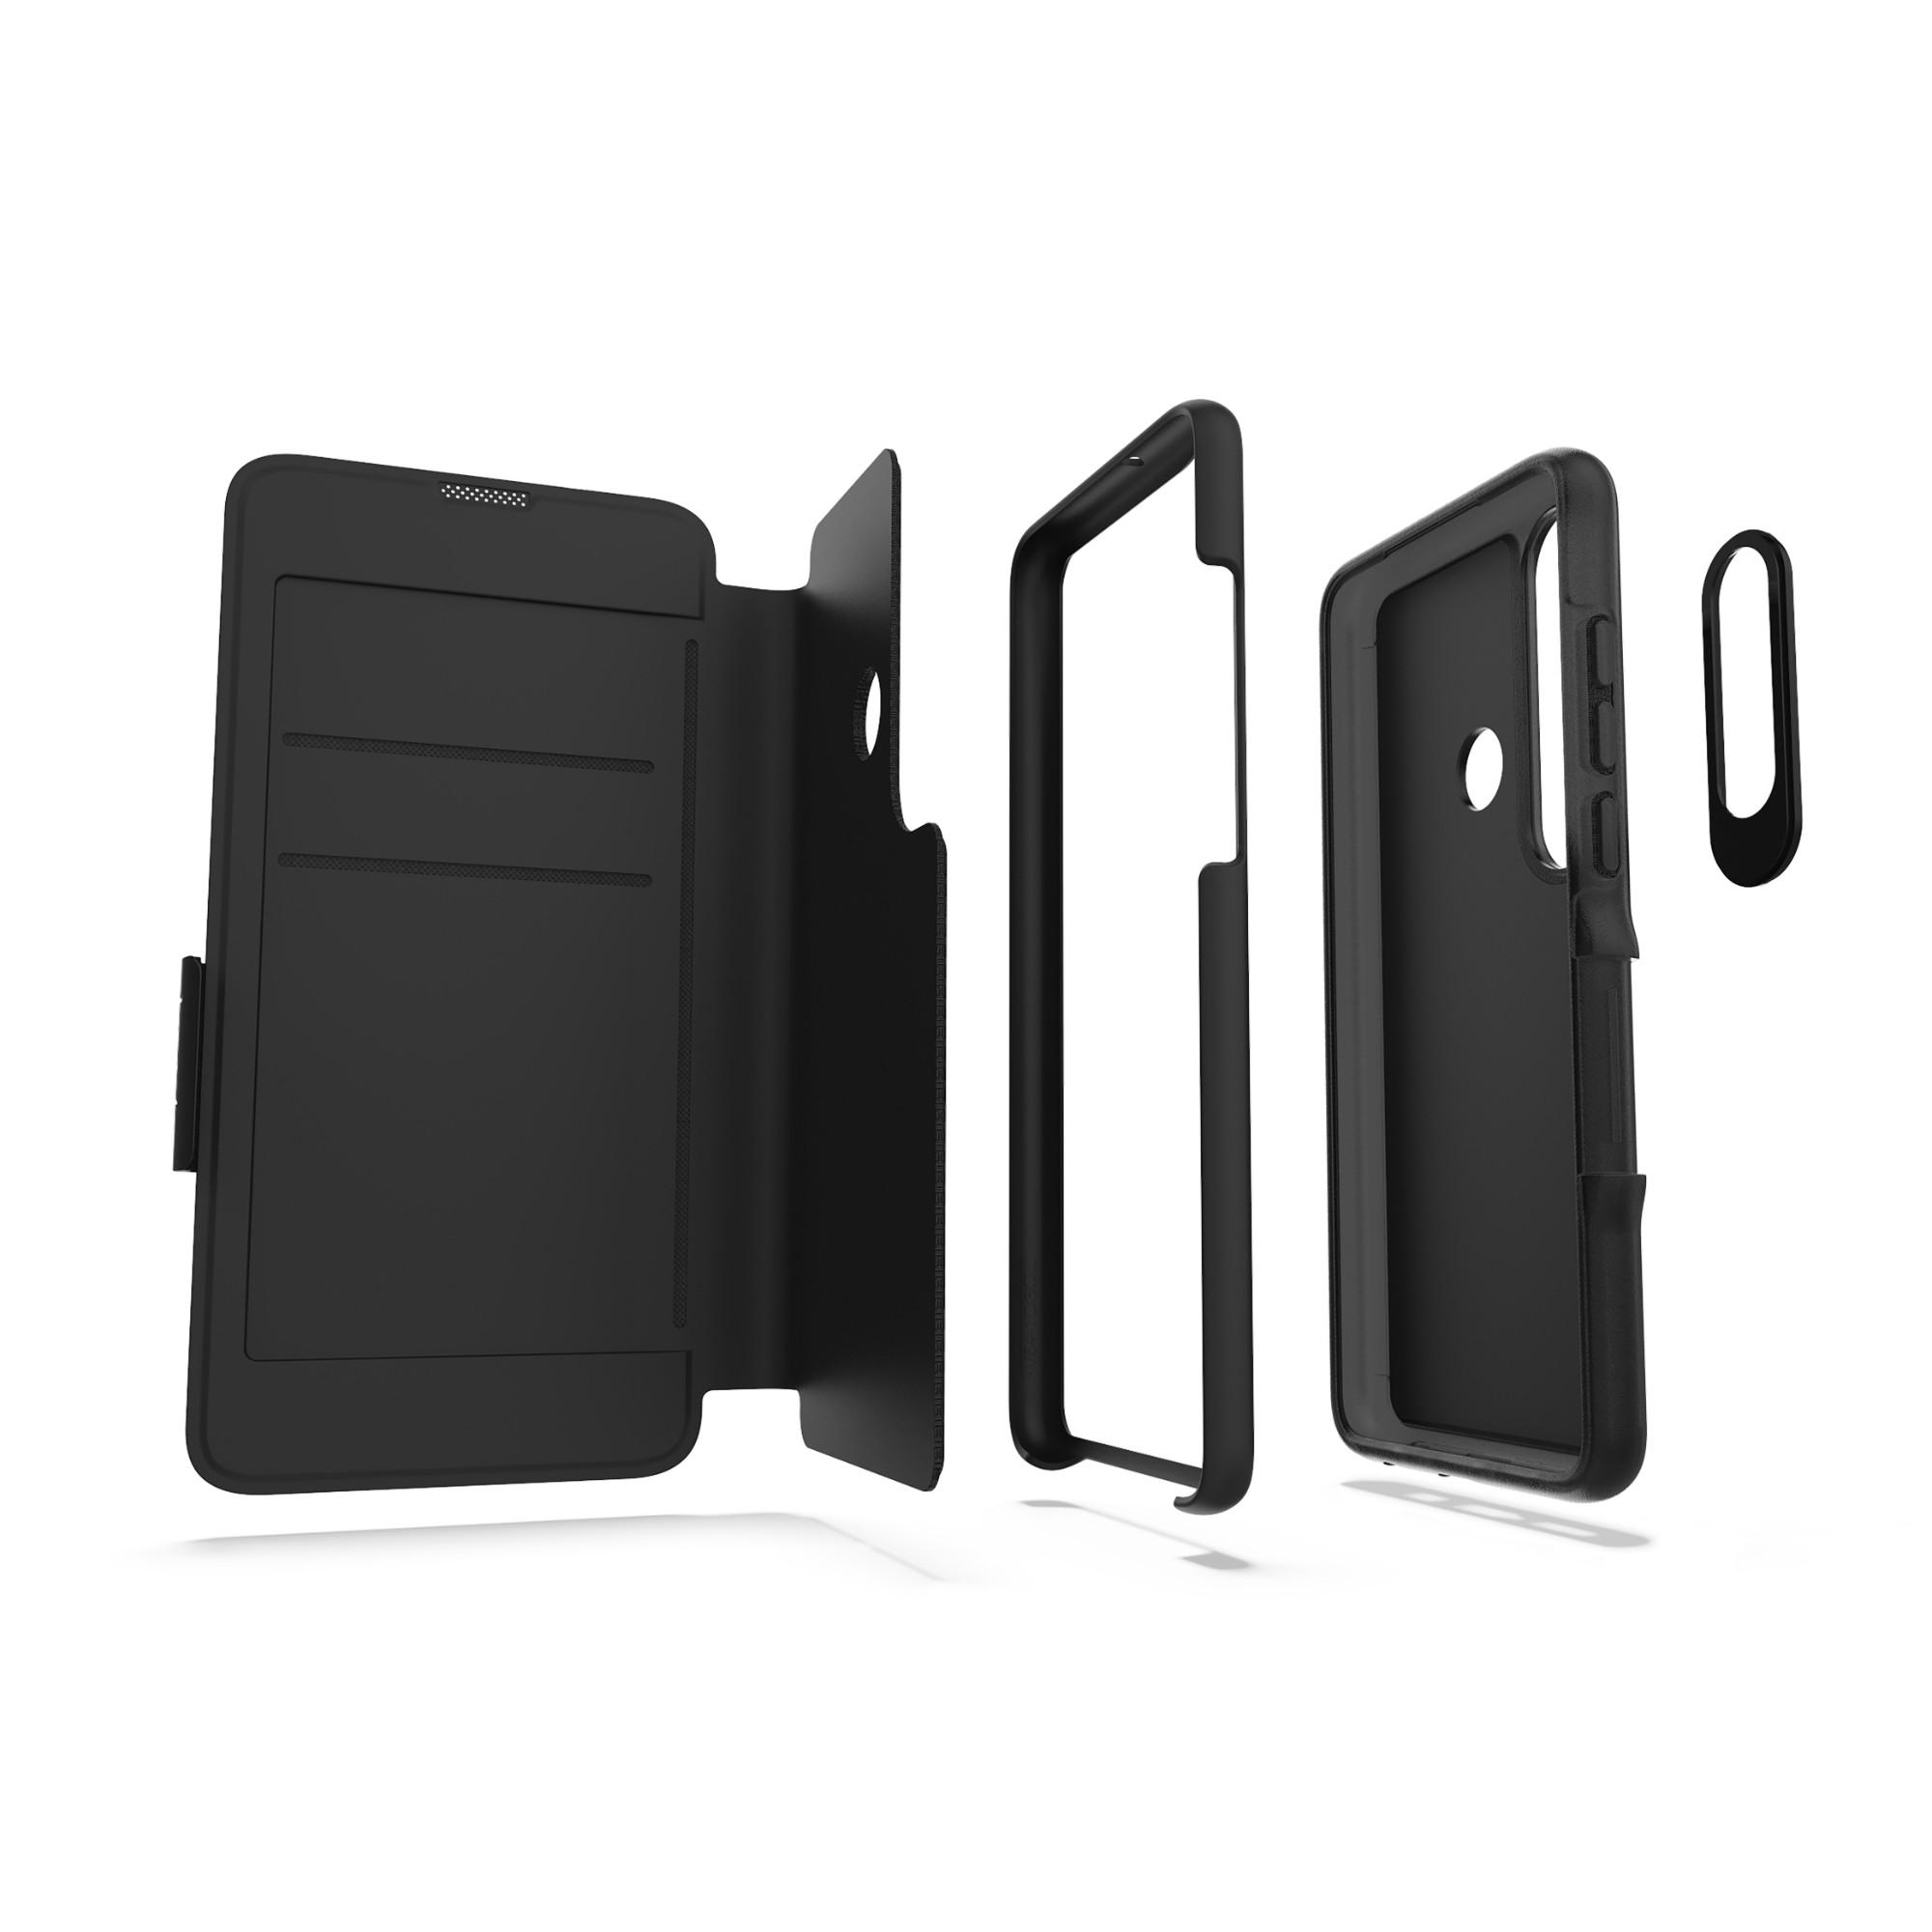 "ZAGG 34910 mobiele telefoon behuizingen 15,6 cm (6.15"") Folioblad Zwart"